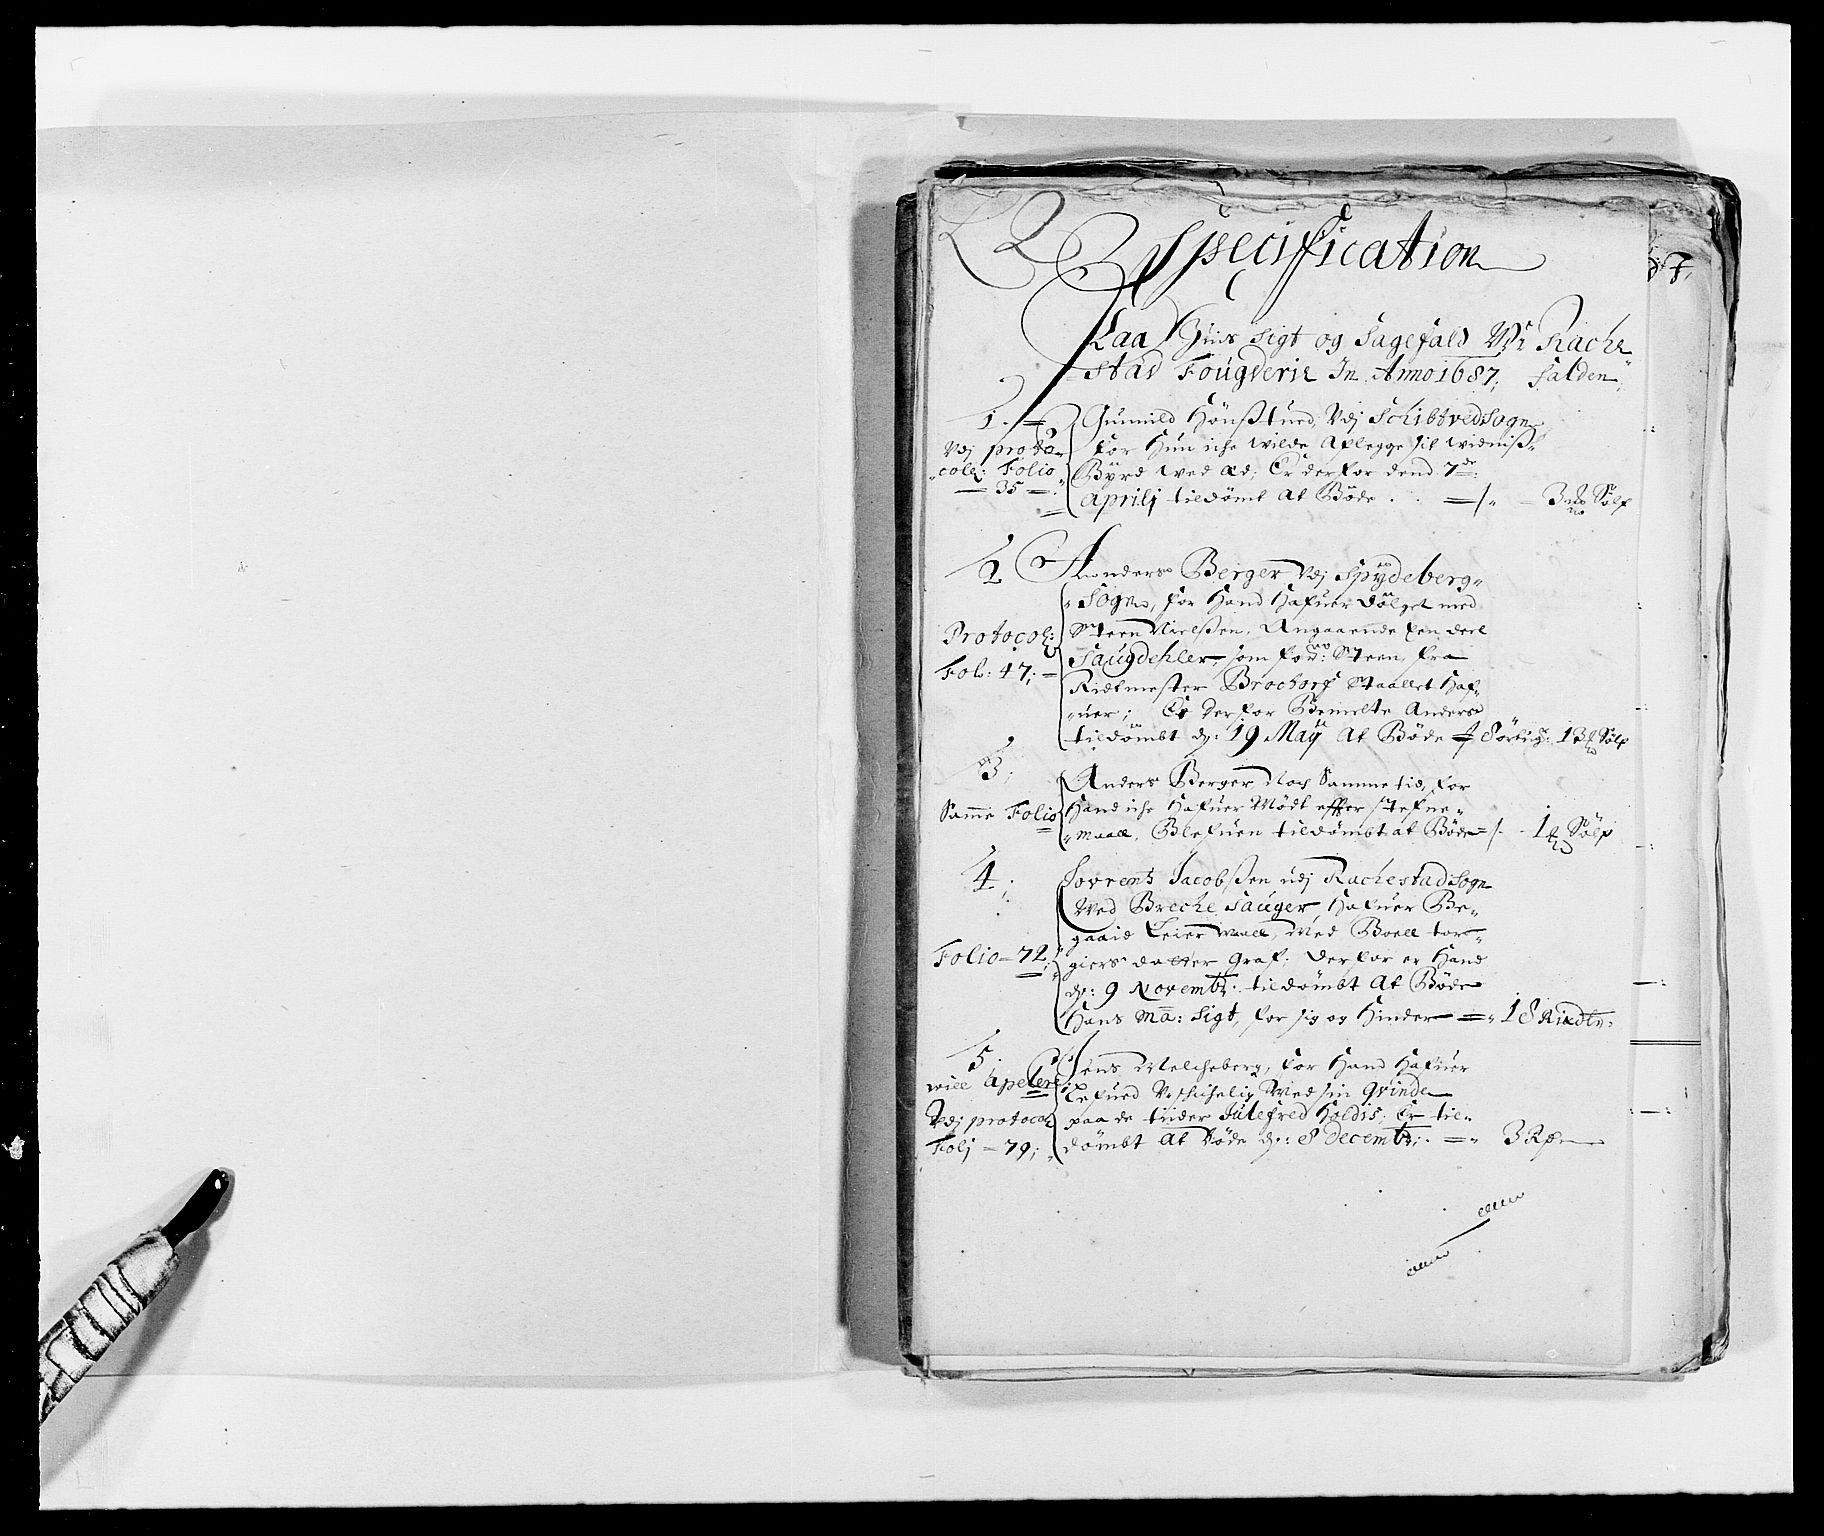 RA, Rentekammeret inntil 1814, Reviderte regnskaper, Fogderegnskap, R05/L0276: Fogderegnskap Rakkestad, 1683-1688, s. 2